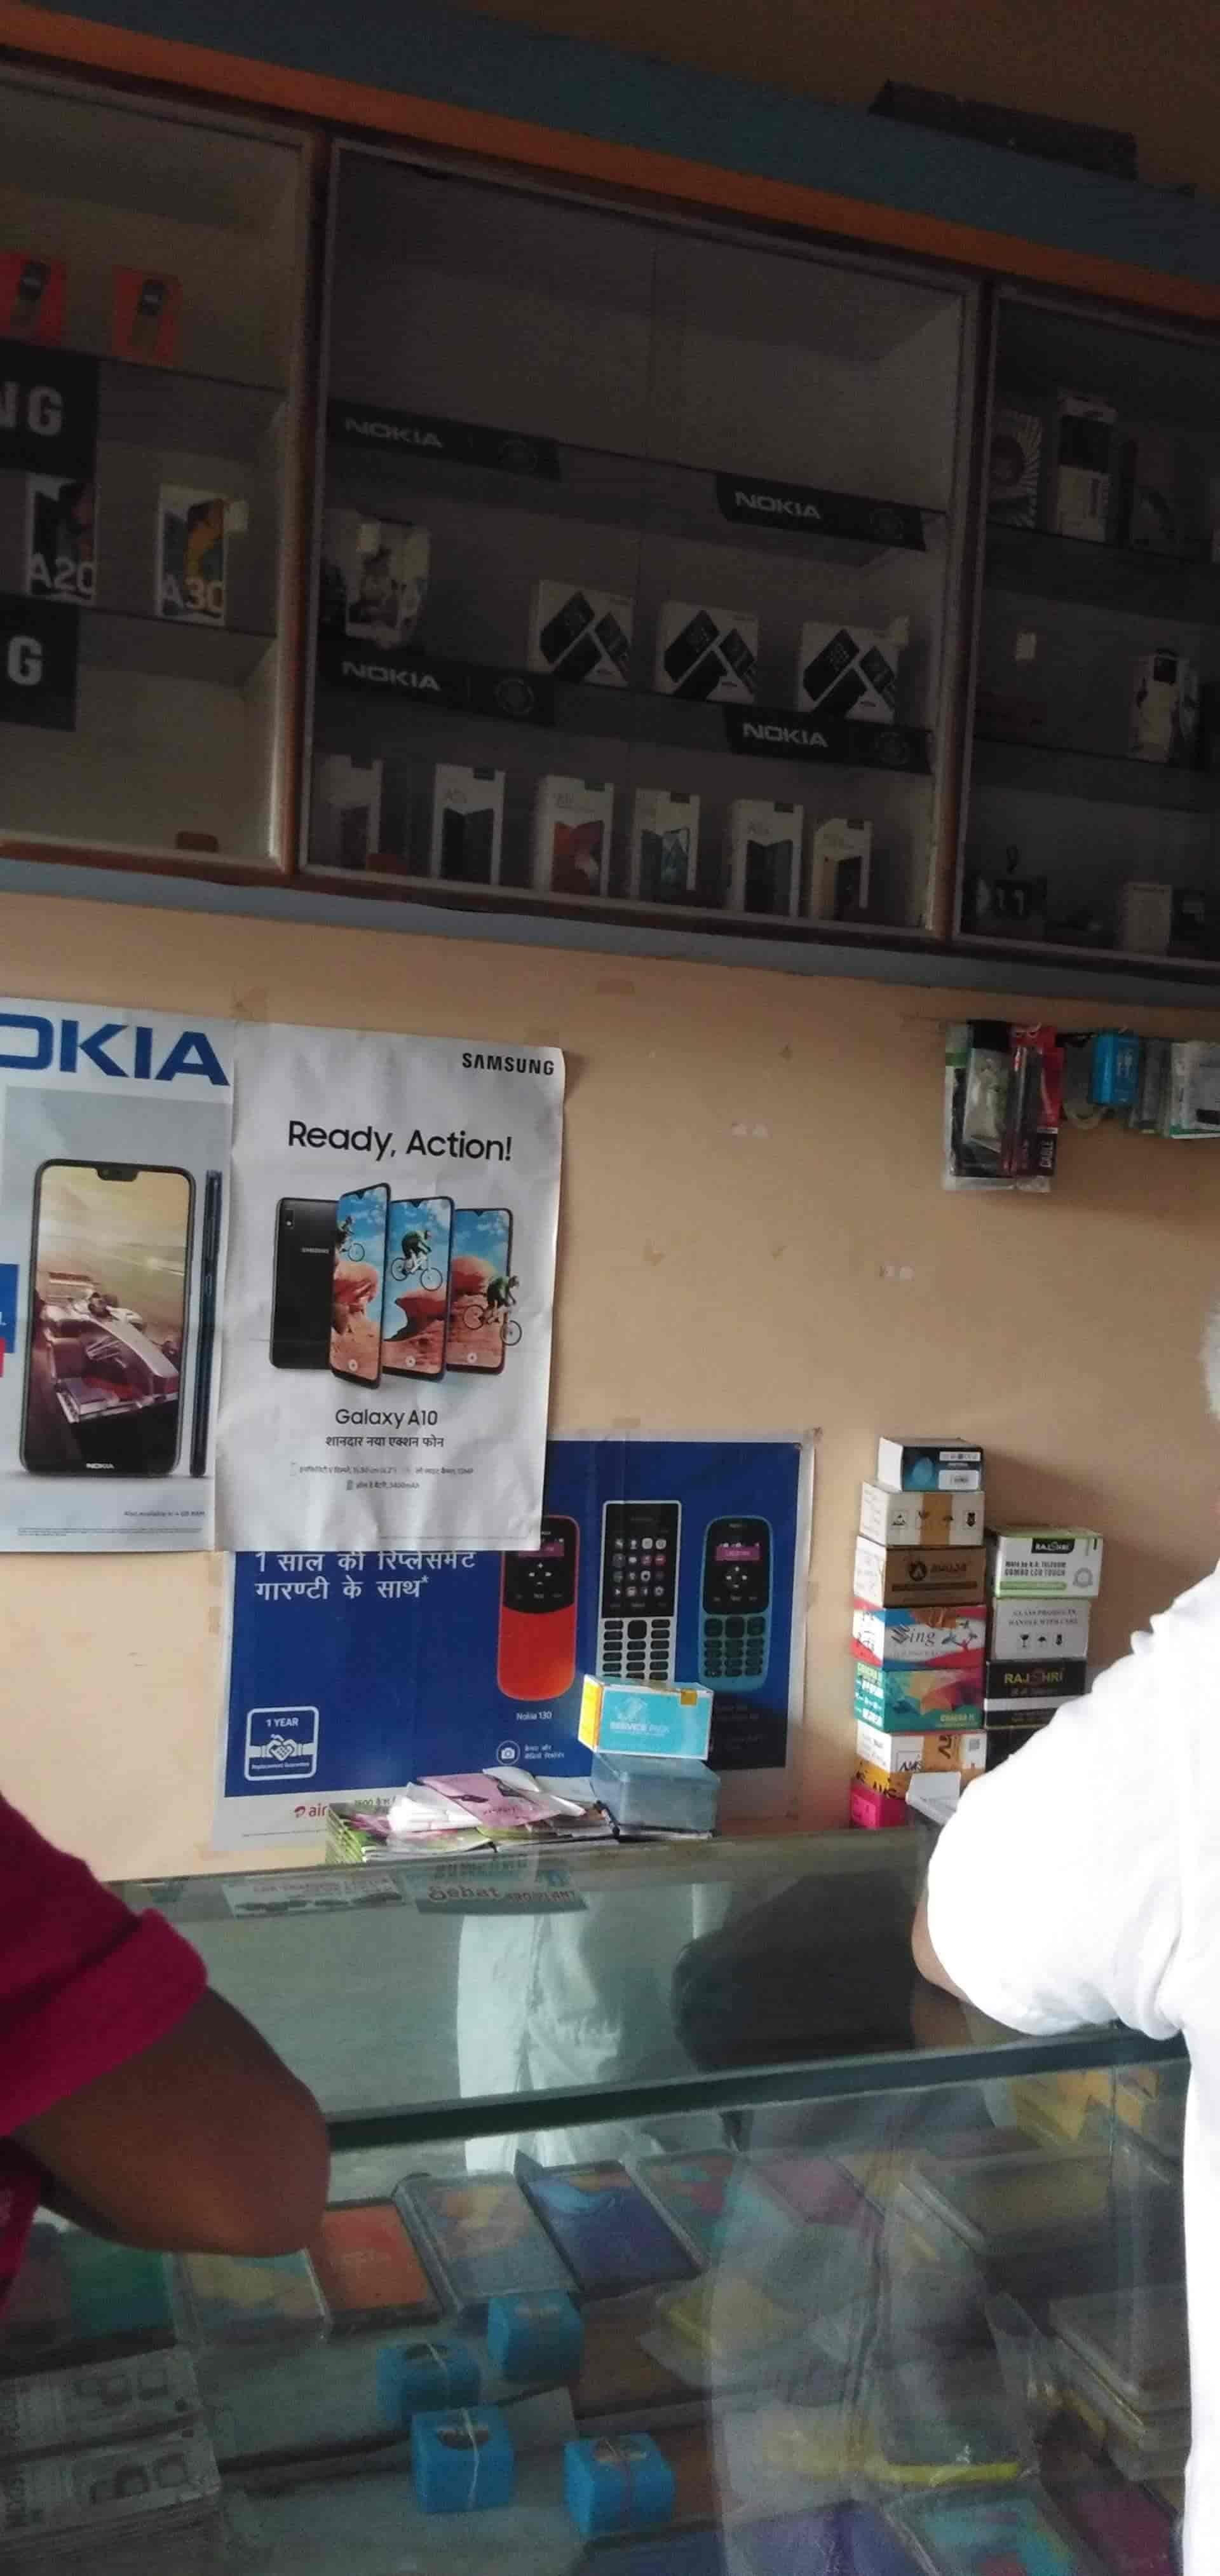 Cdma Gsm Communication Photos, Pahariya, Varanasi- Pictures